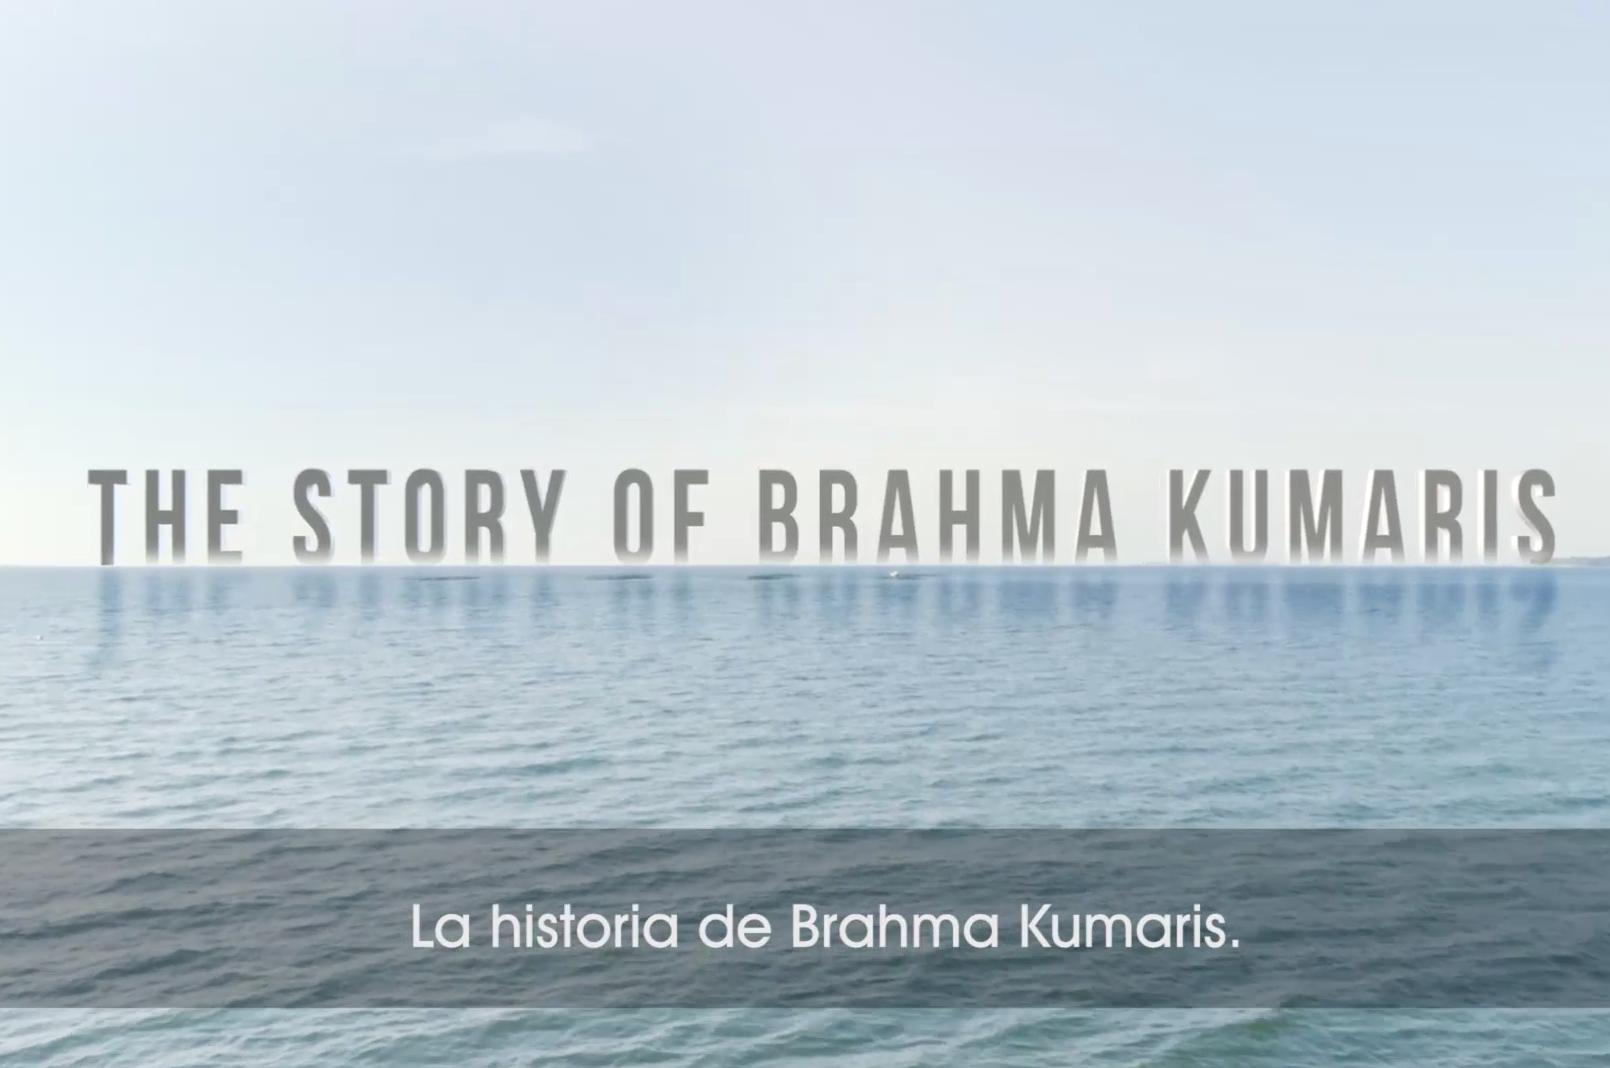 Presentacion Brahma Kumaris 2019